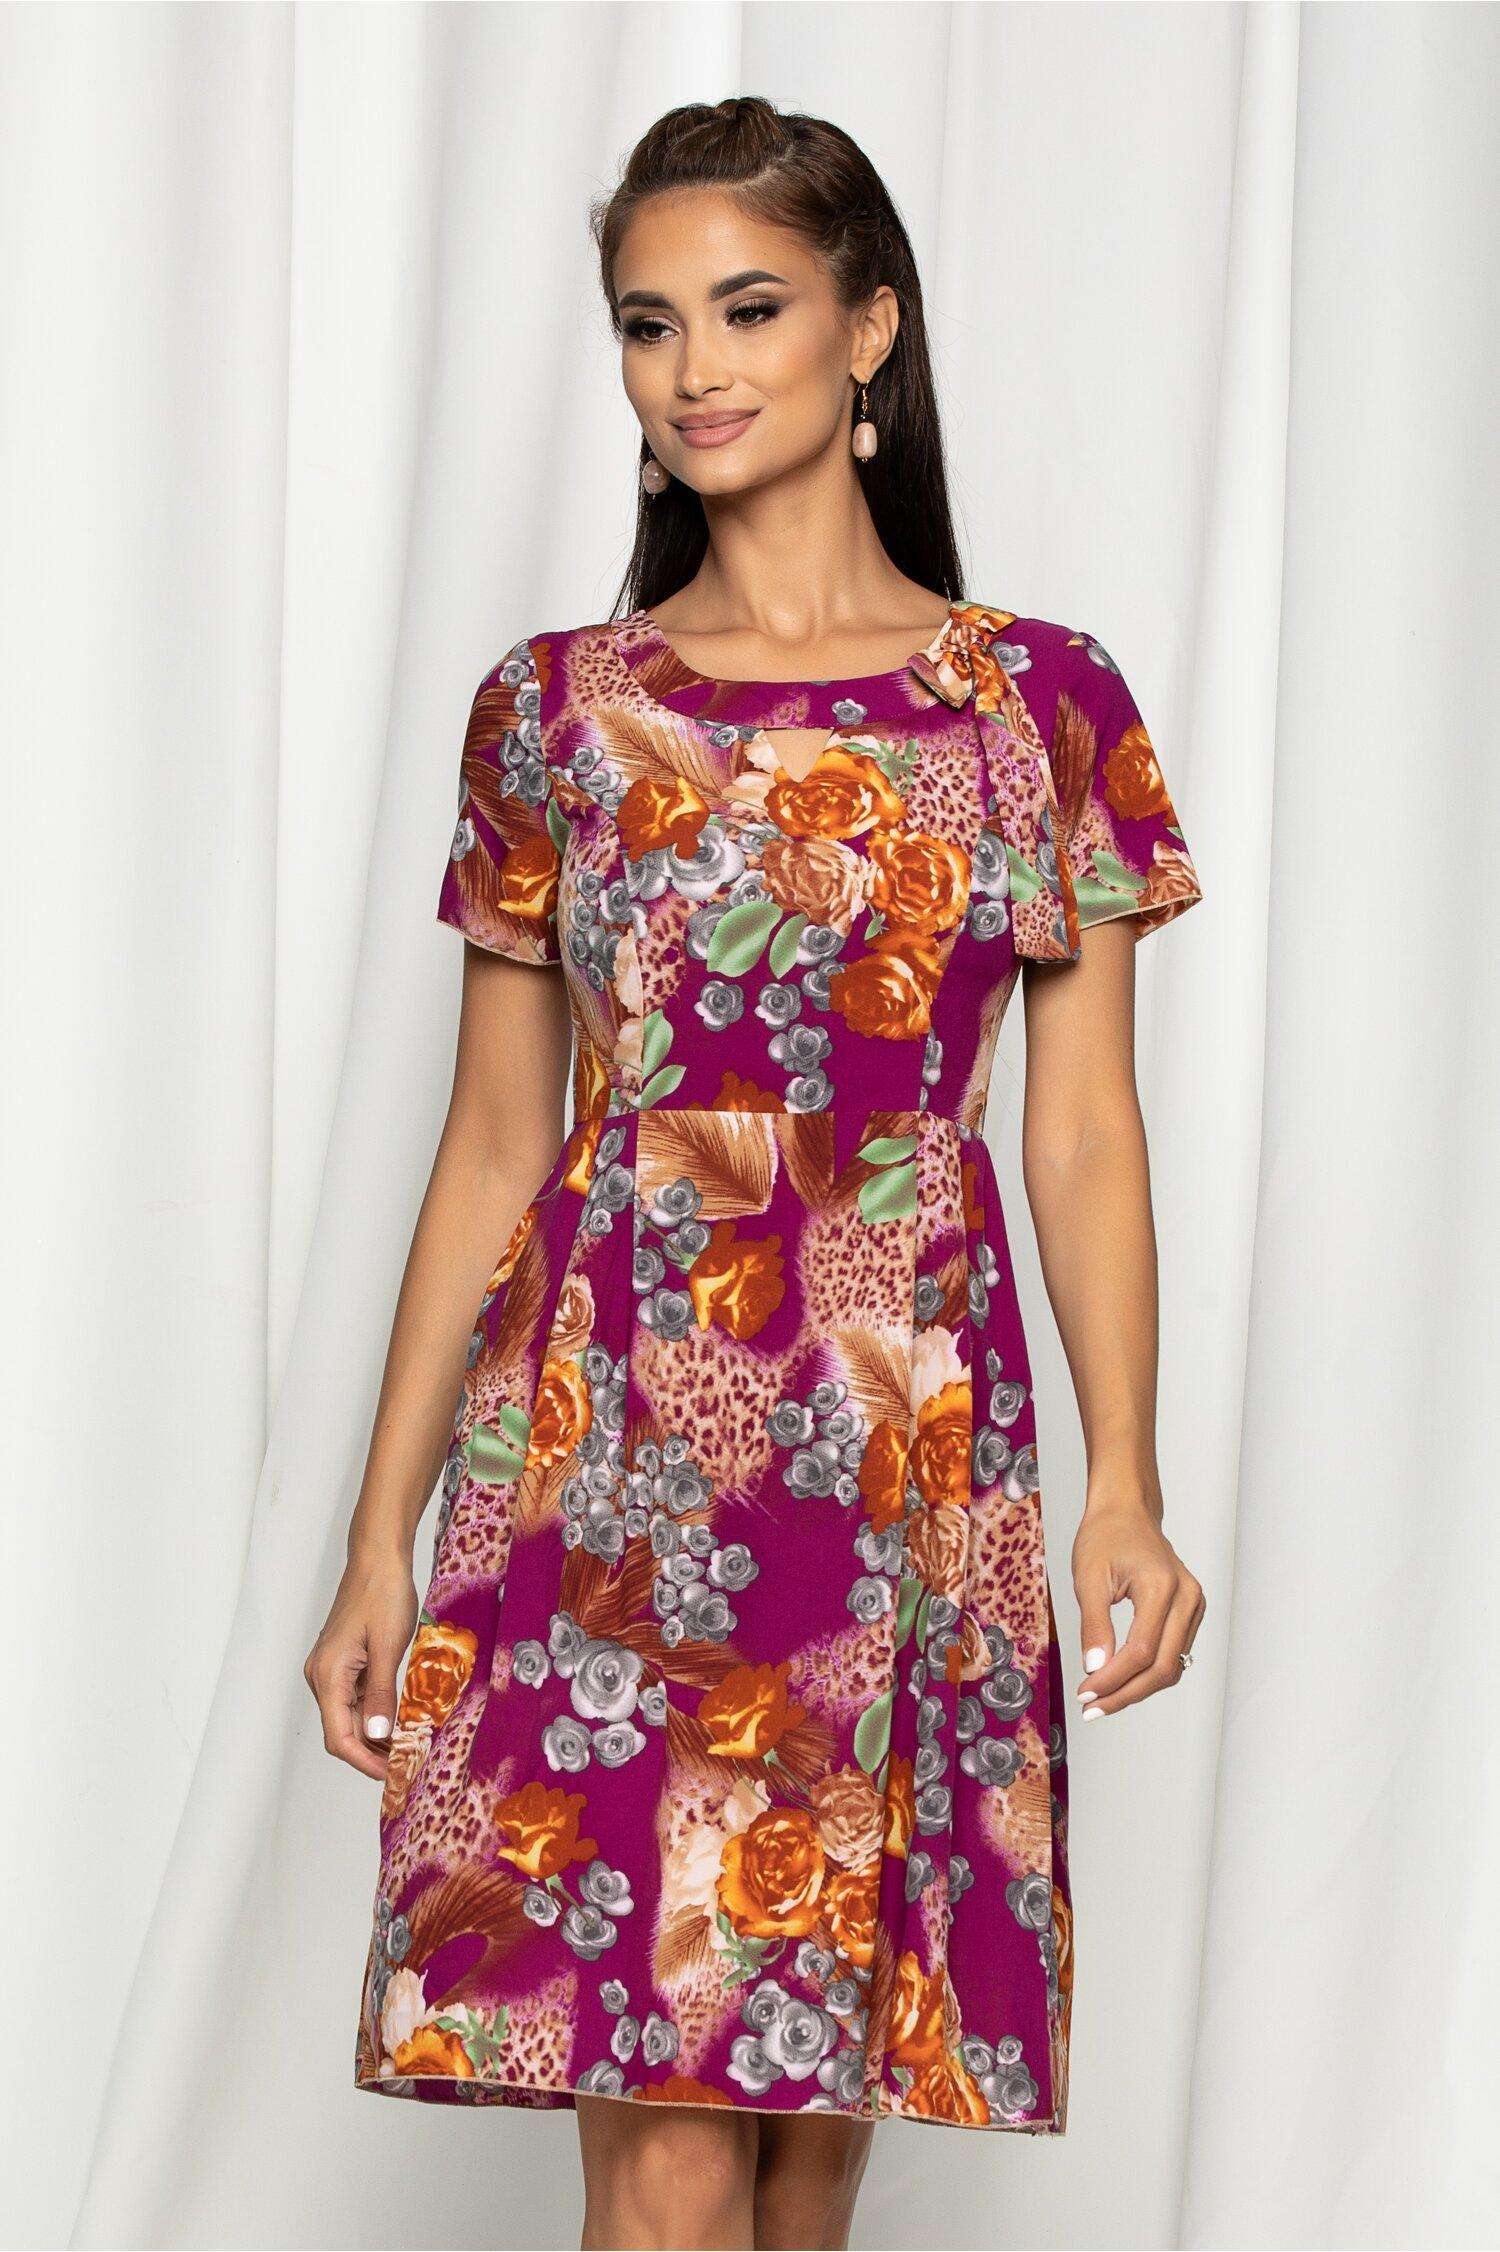 Rochie Adriela violet cu flori orange si fundita in zona decolteului